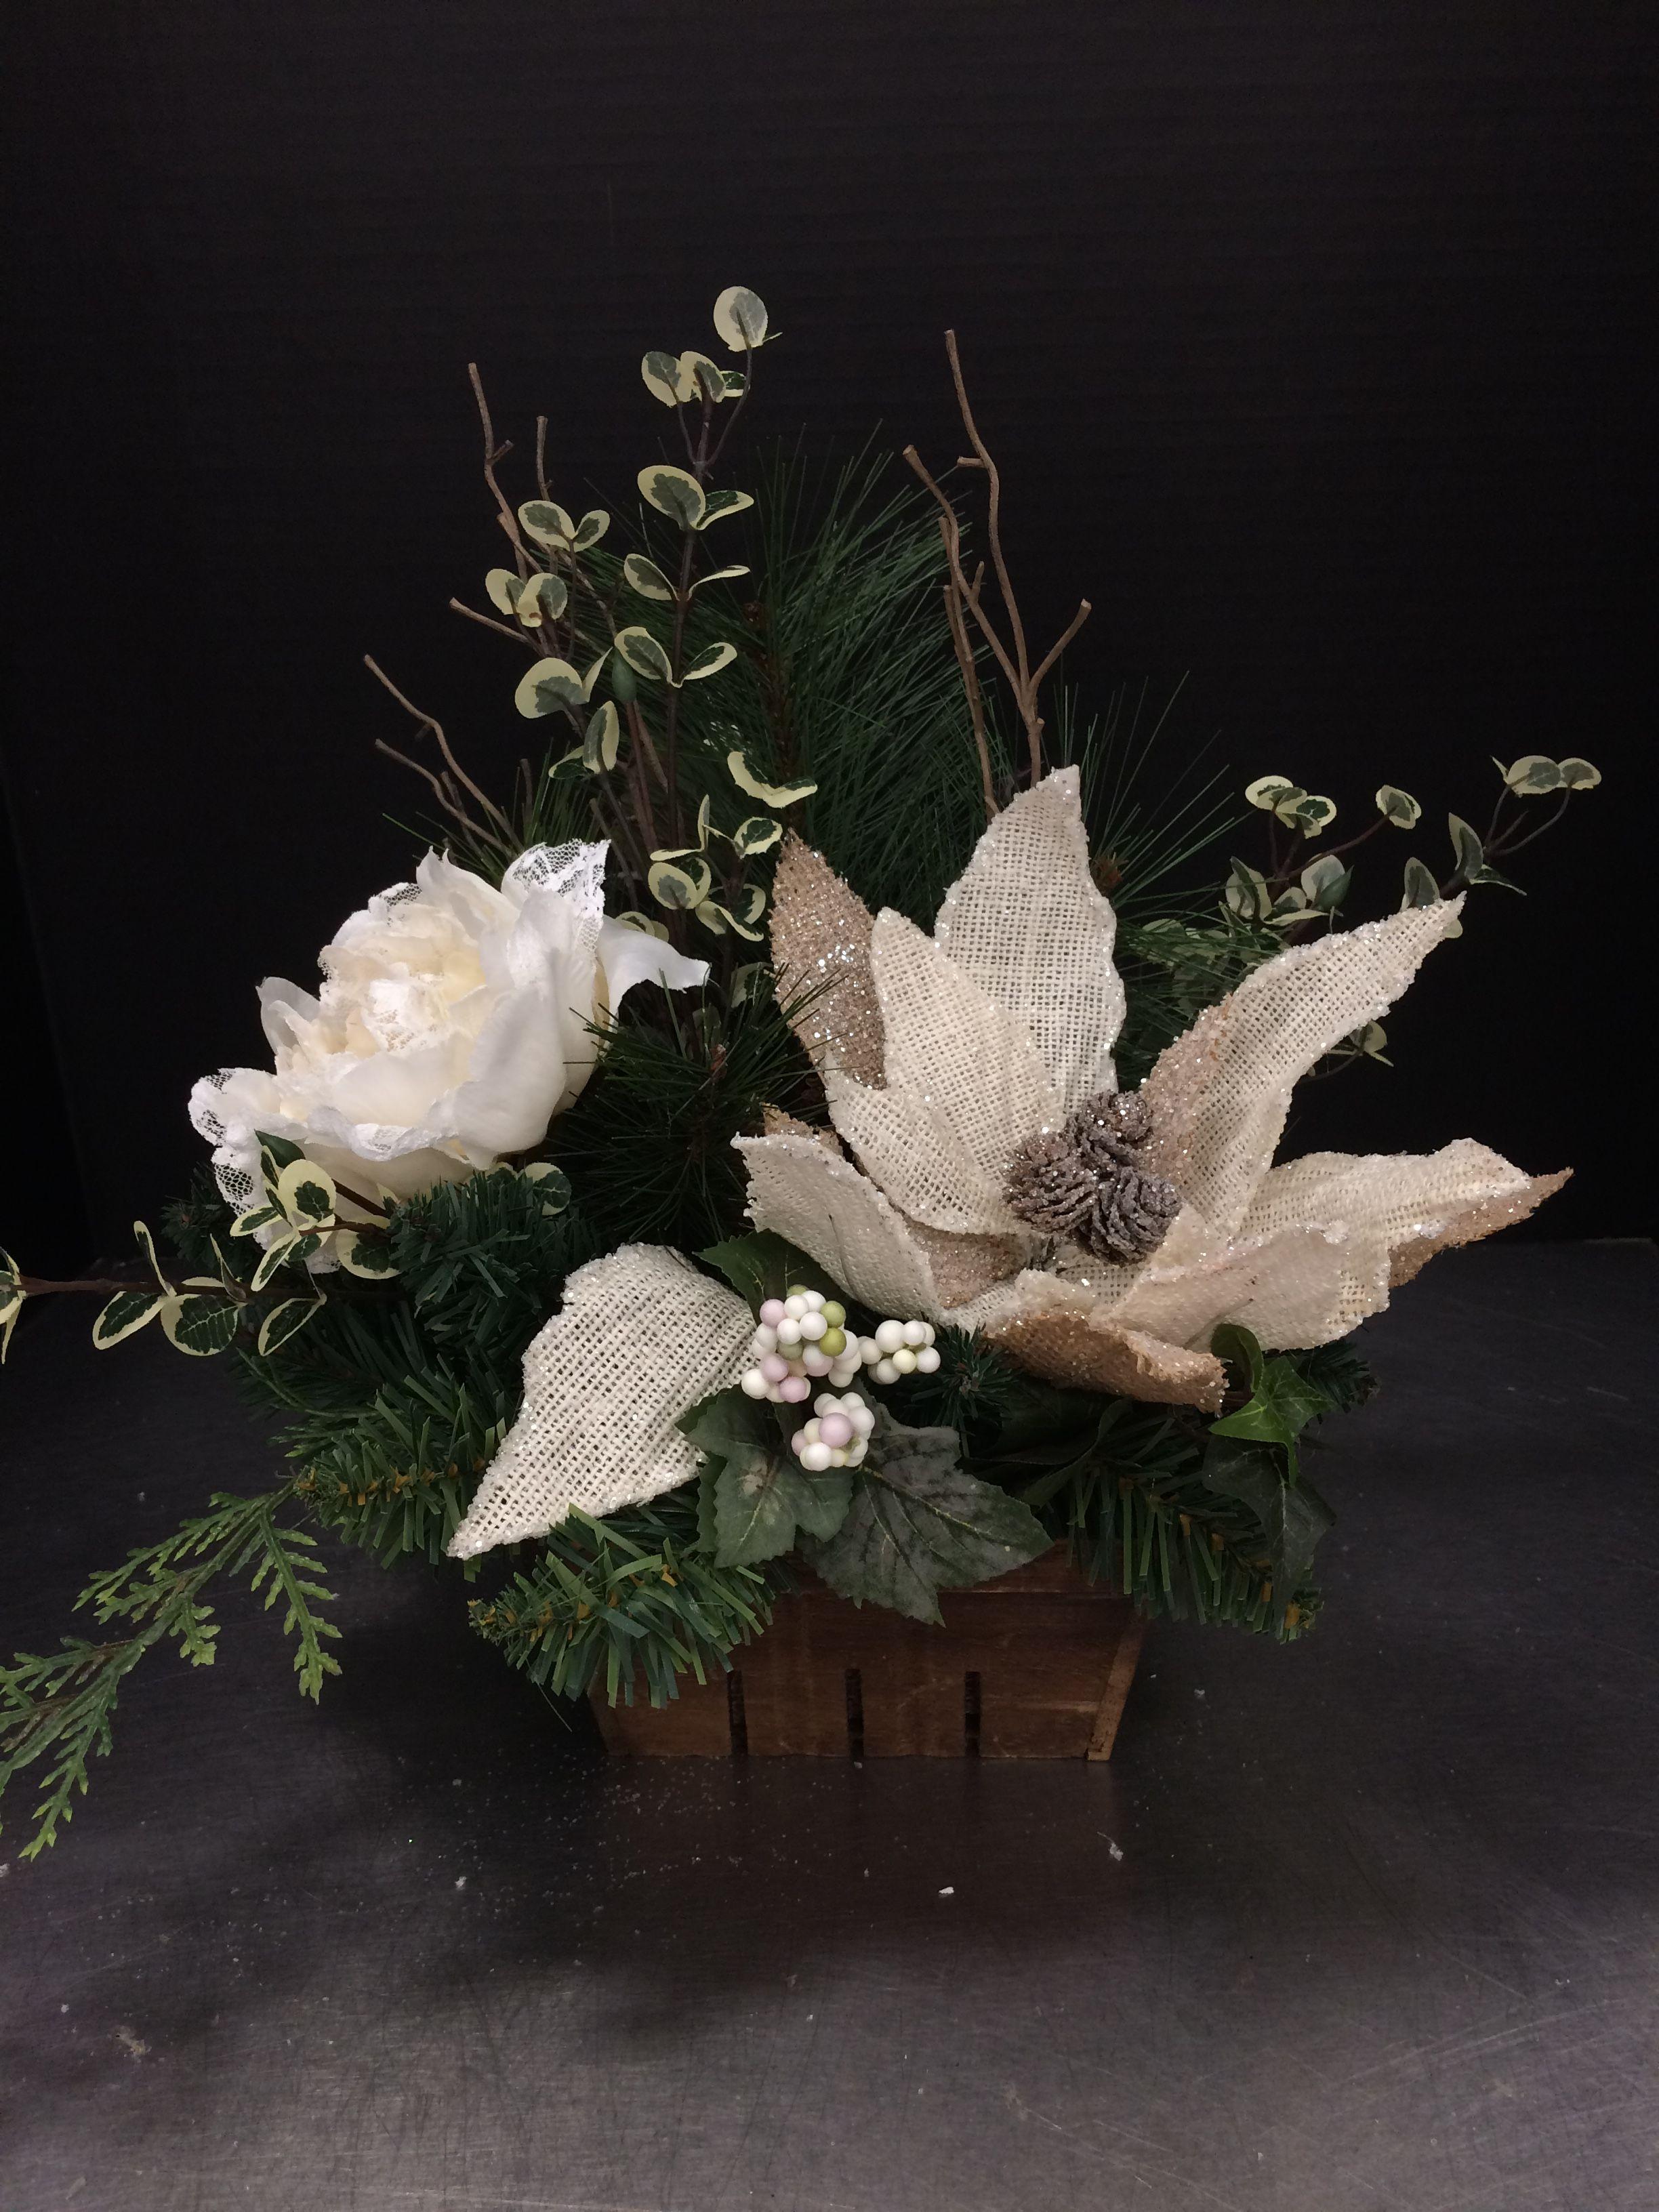 Burlap Poinsettia 2016 by Andrea